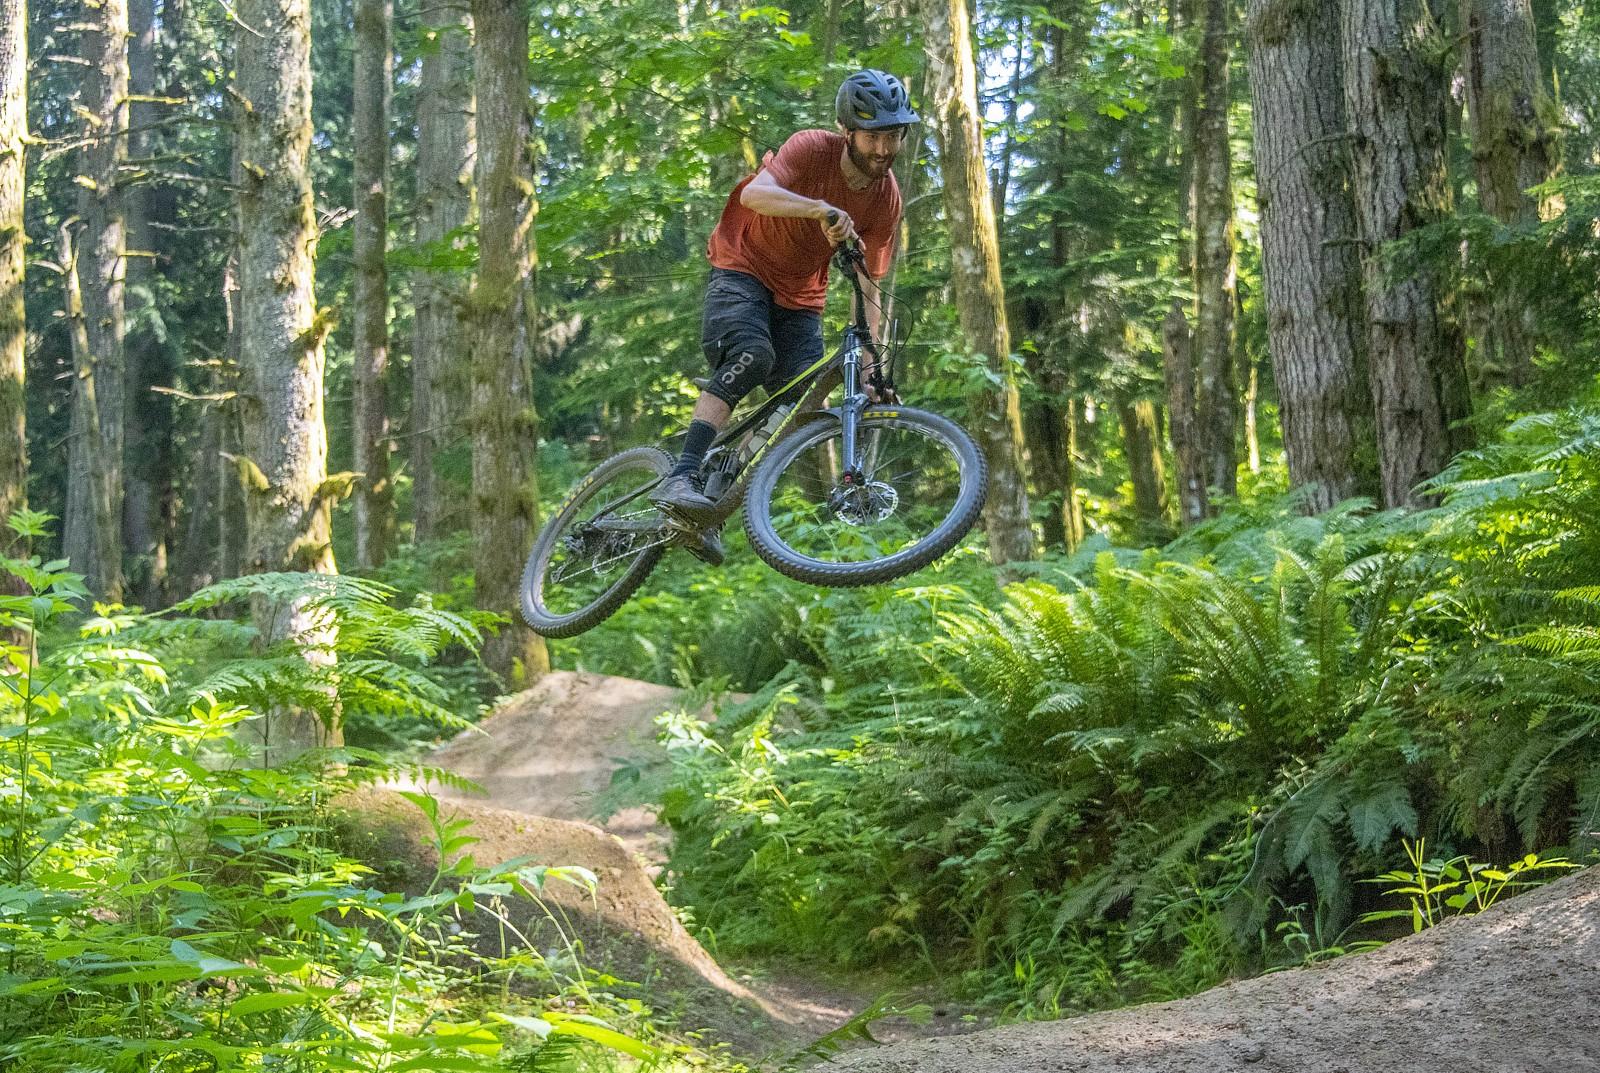 Bellingham jump 2 - jebvt - Mountain Biking Pictures - Vital MTB